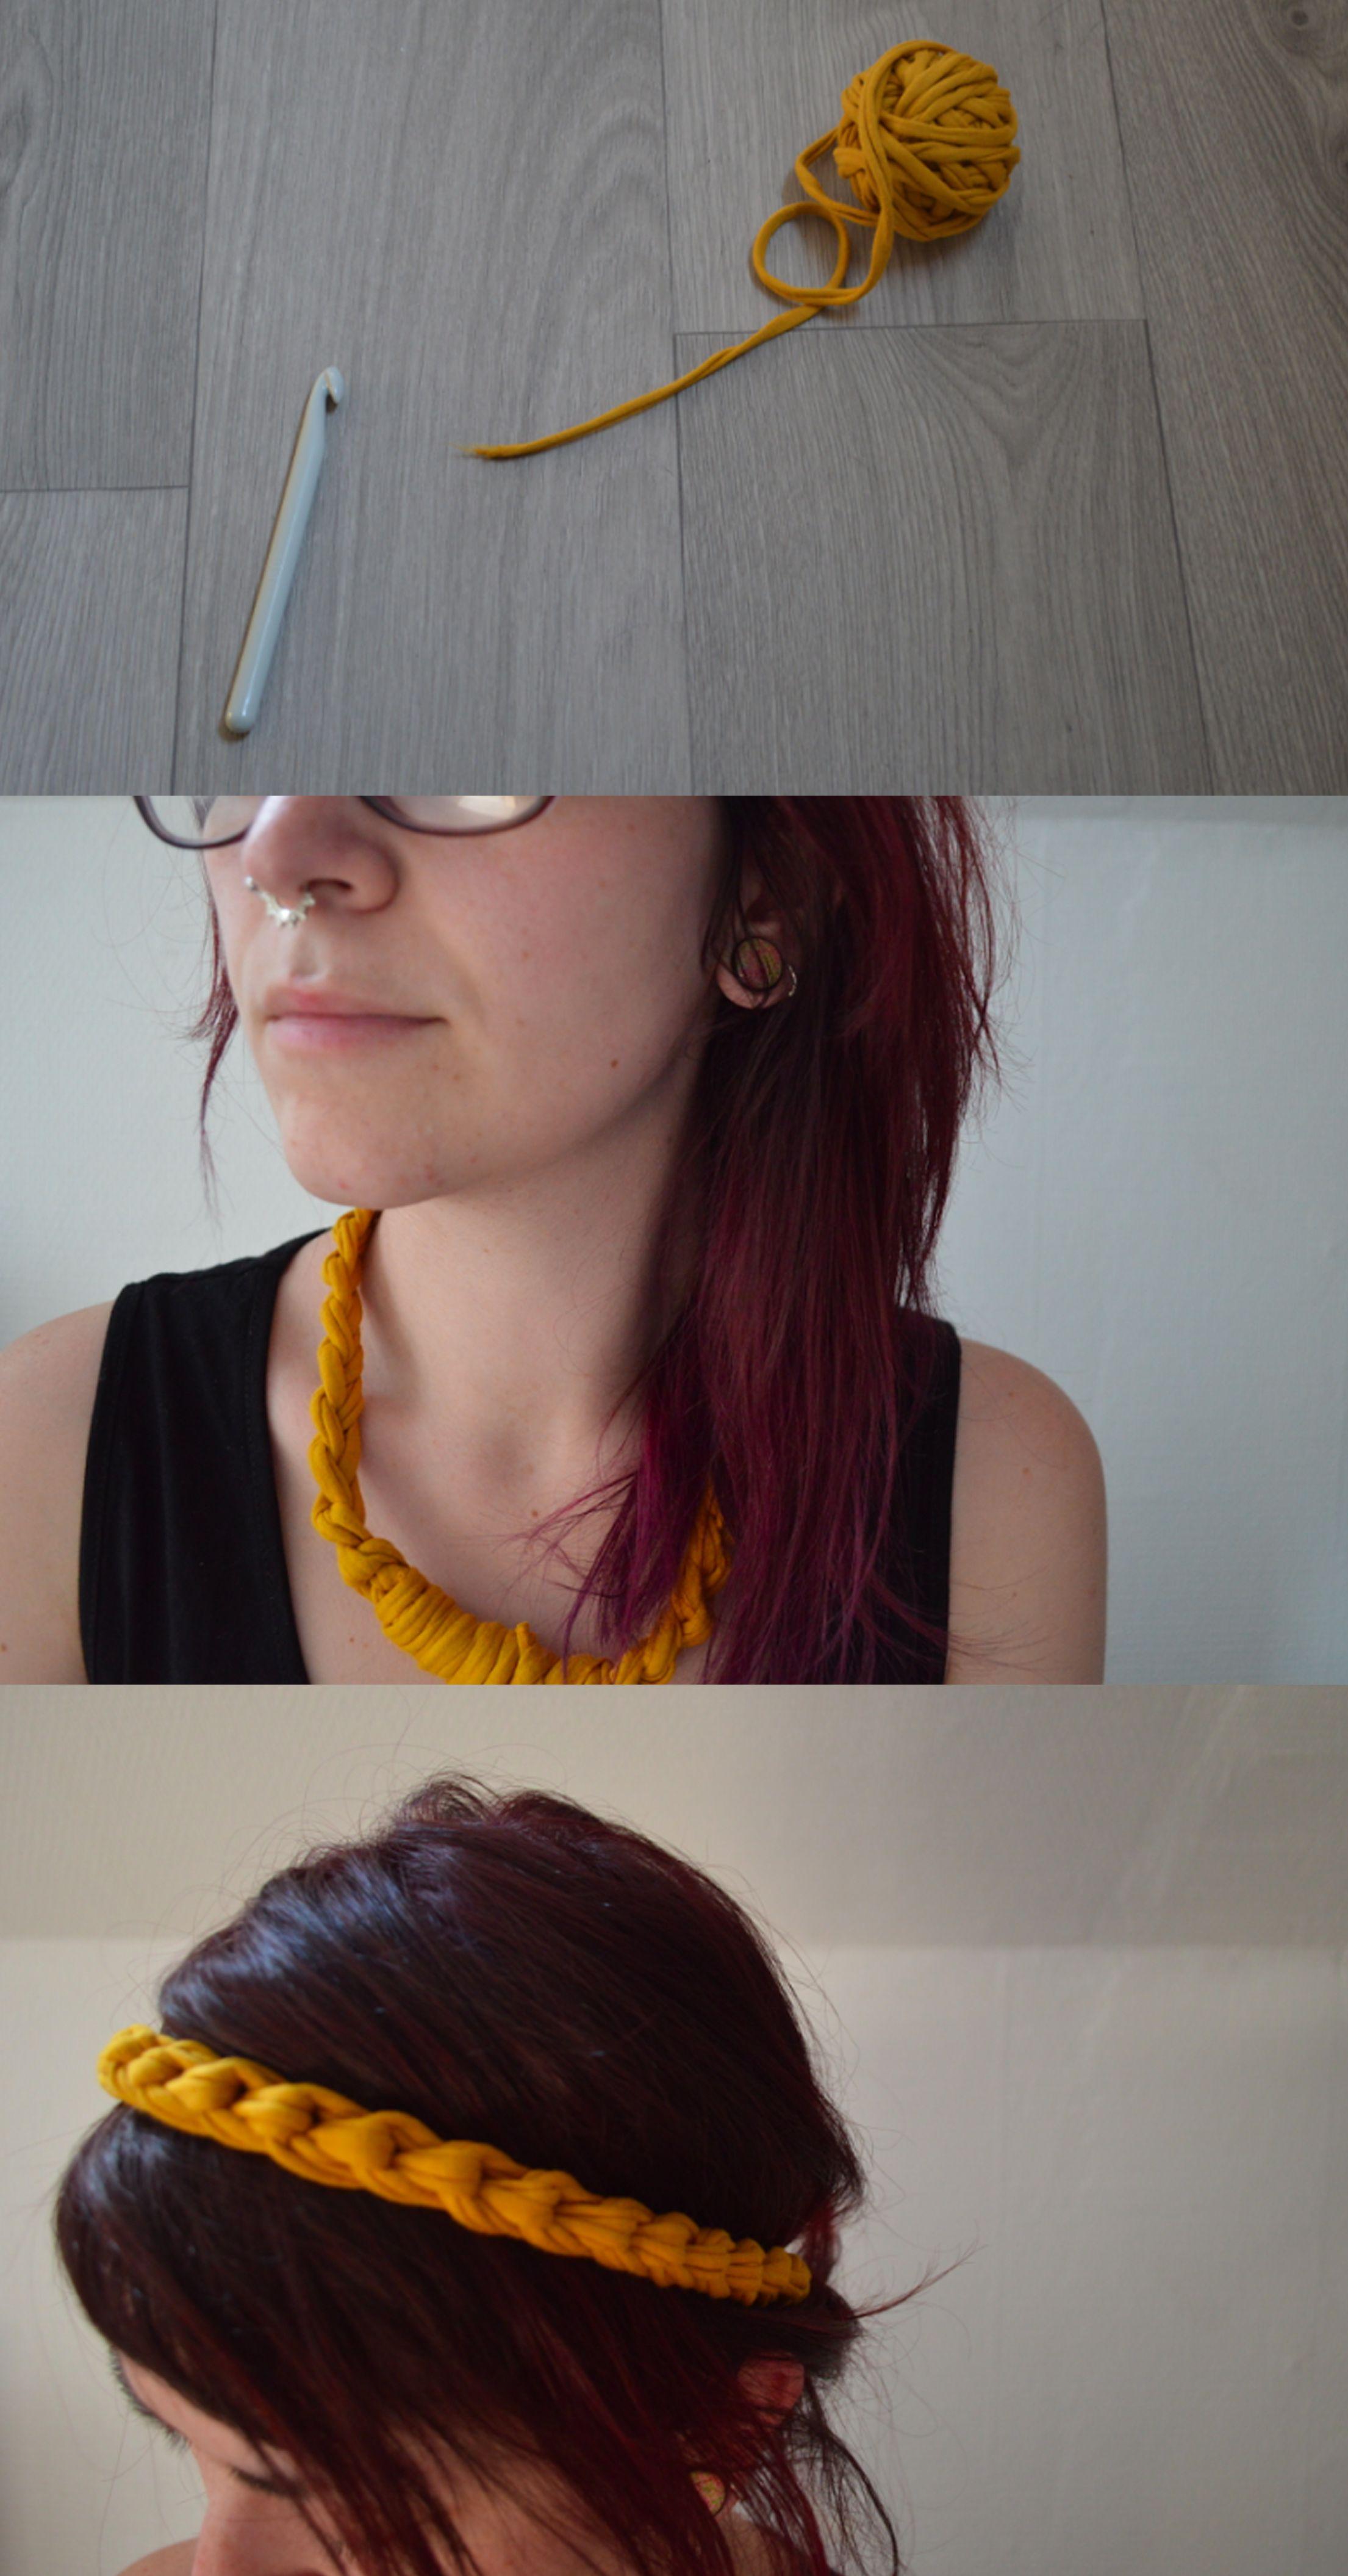 http://leheaumedelamort.blogspot.fr/2014/09/diy-le-maxi-headband-collier-au-crochet.html